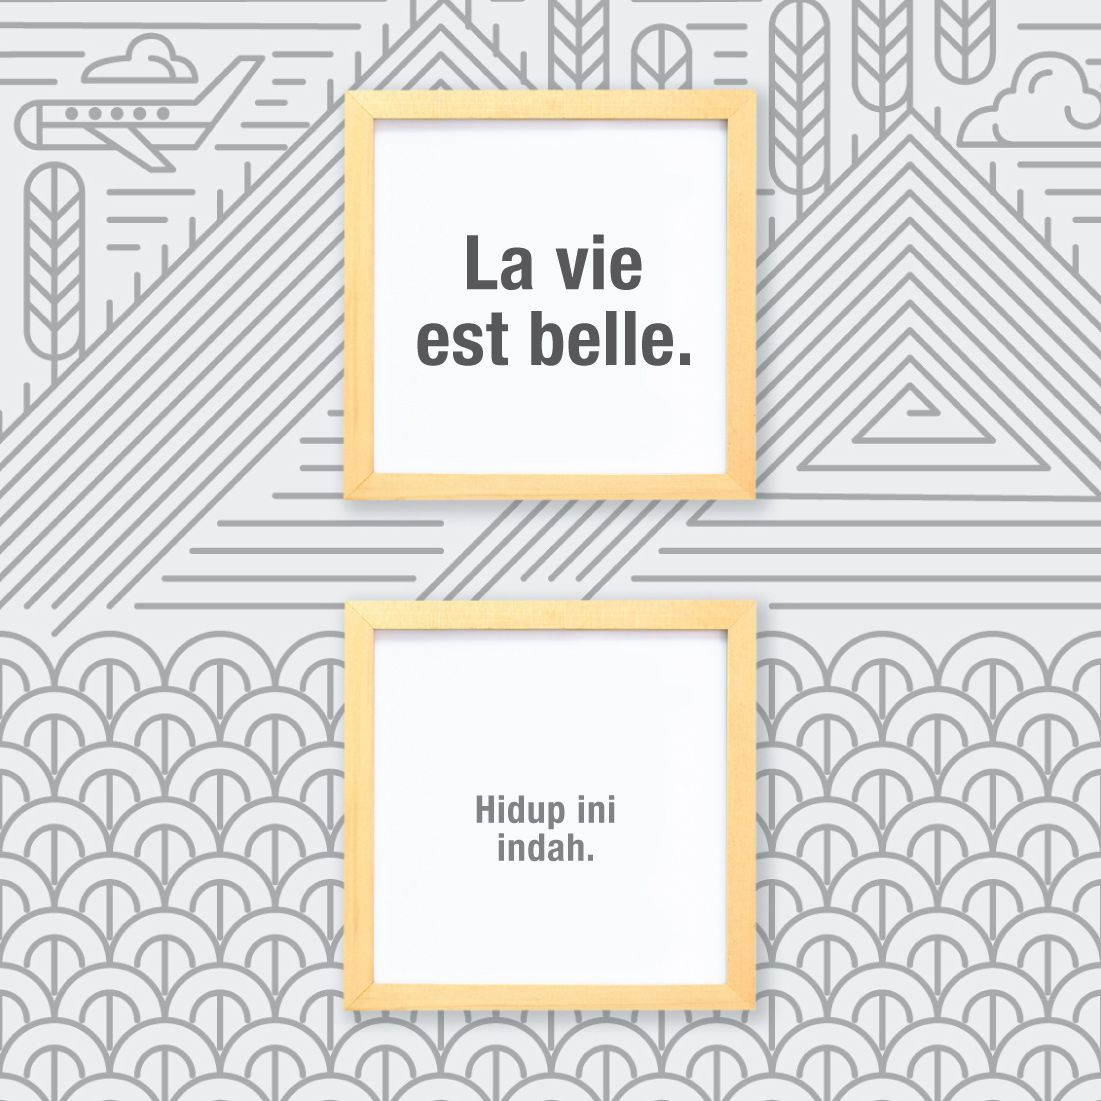 quote la vie est belle artinya hidup ini indah hidup